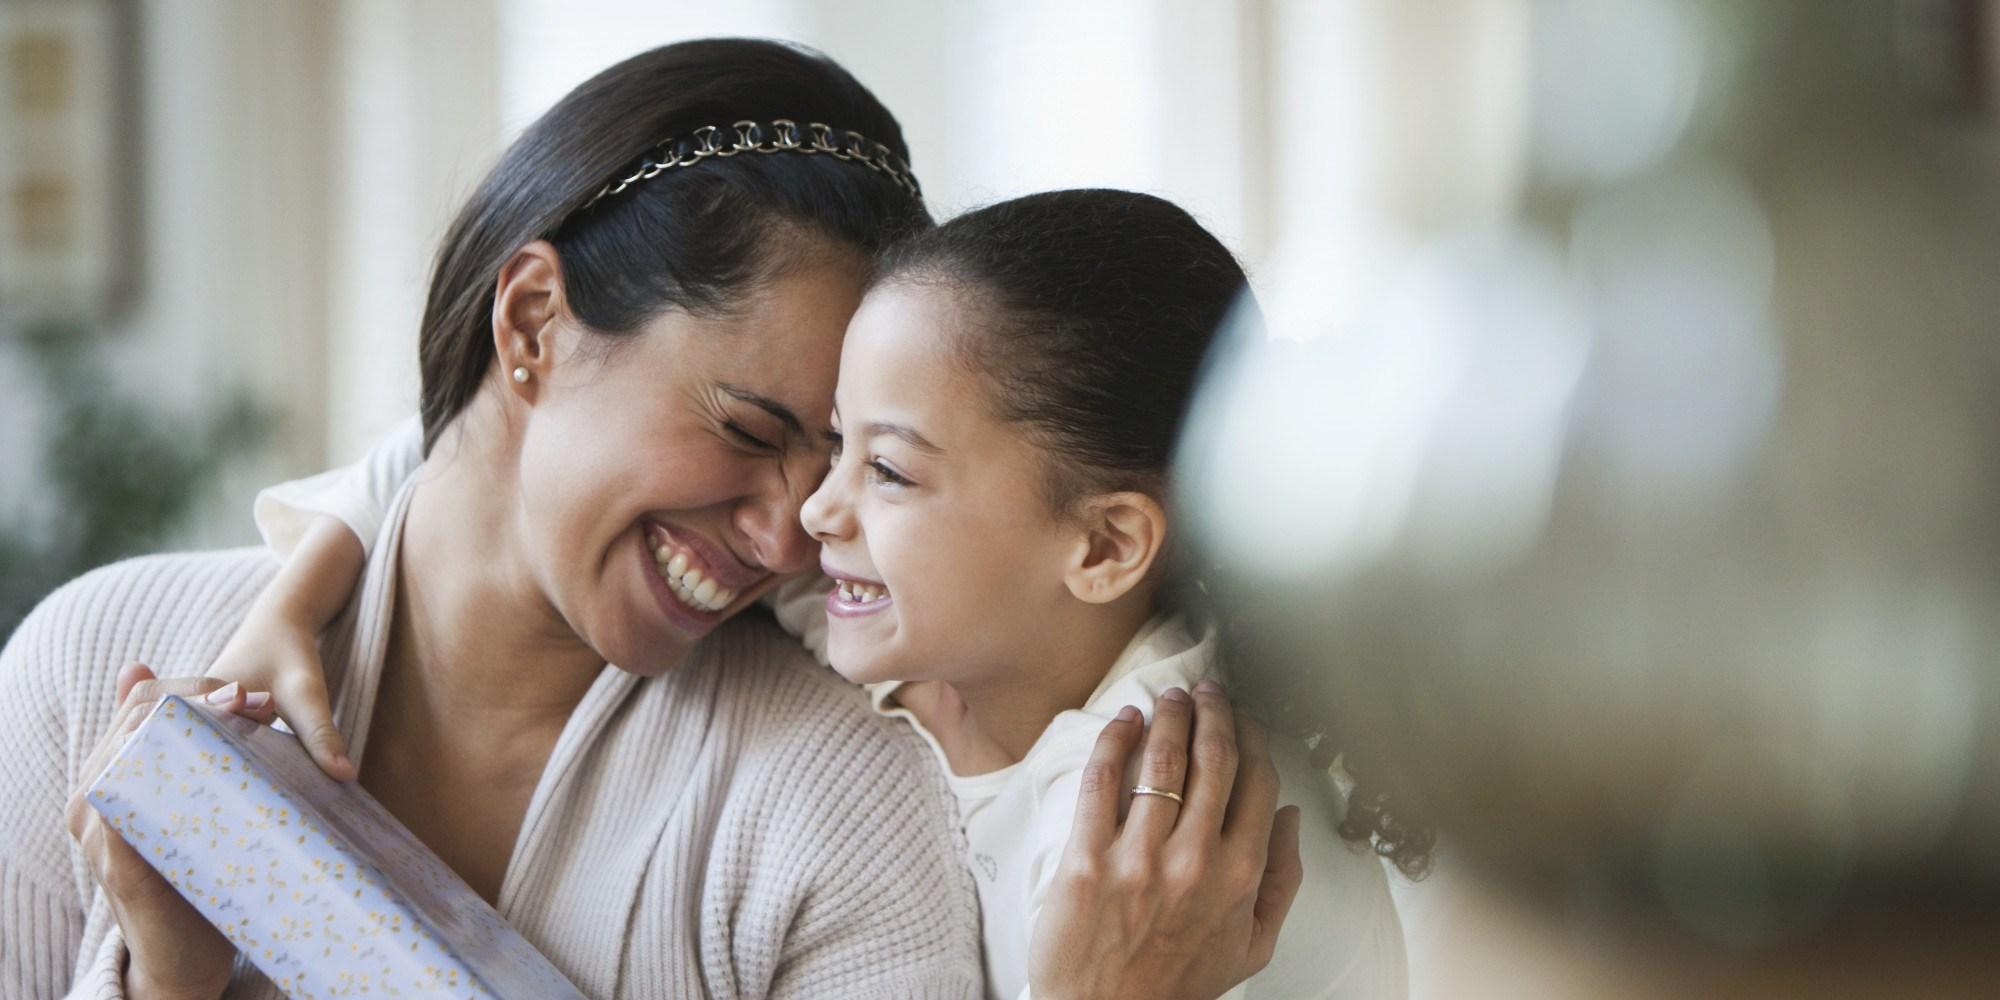 Hispanic girl giving mother birthday gift